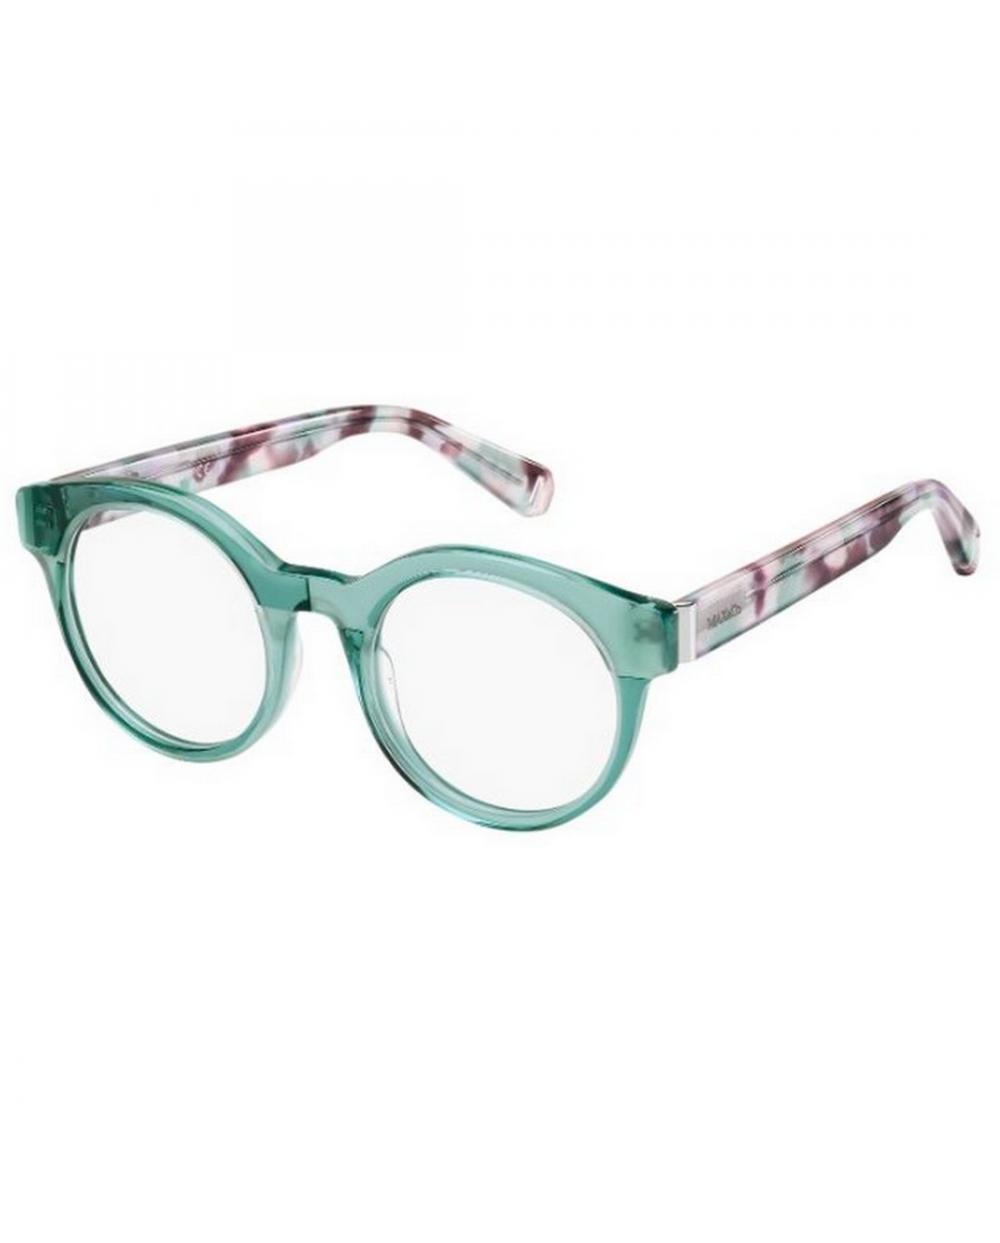 Brille von vista Max&Co 313 originalverpackung garantie italien